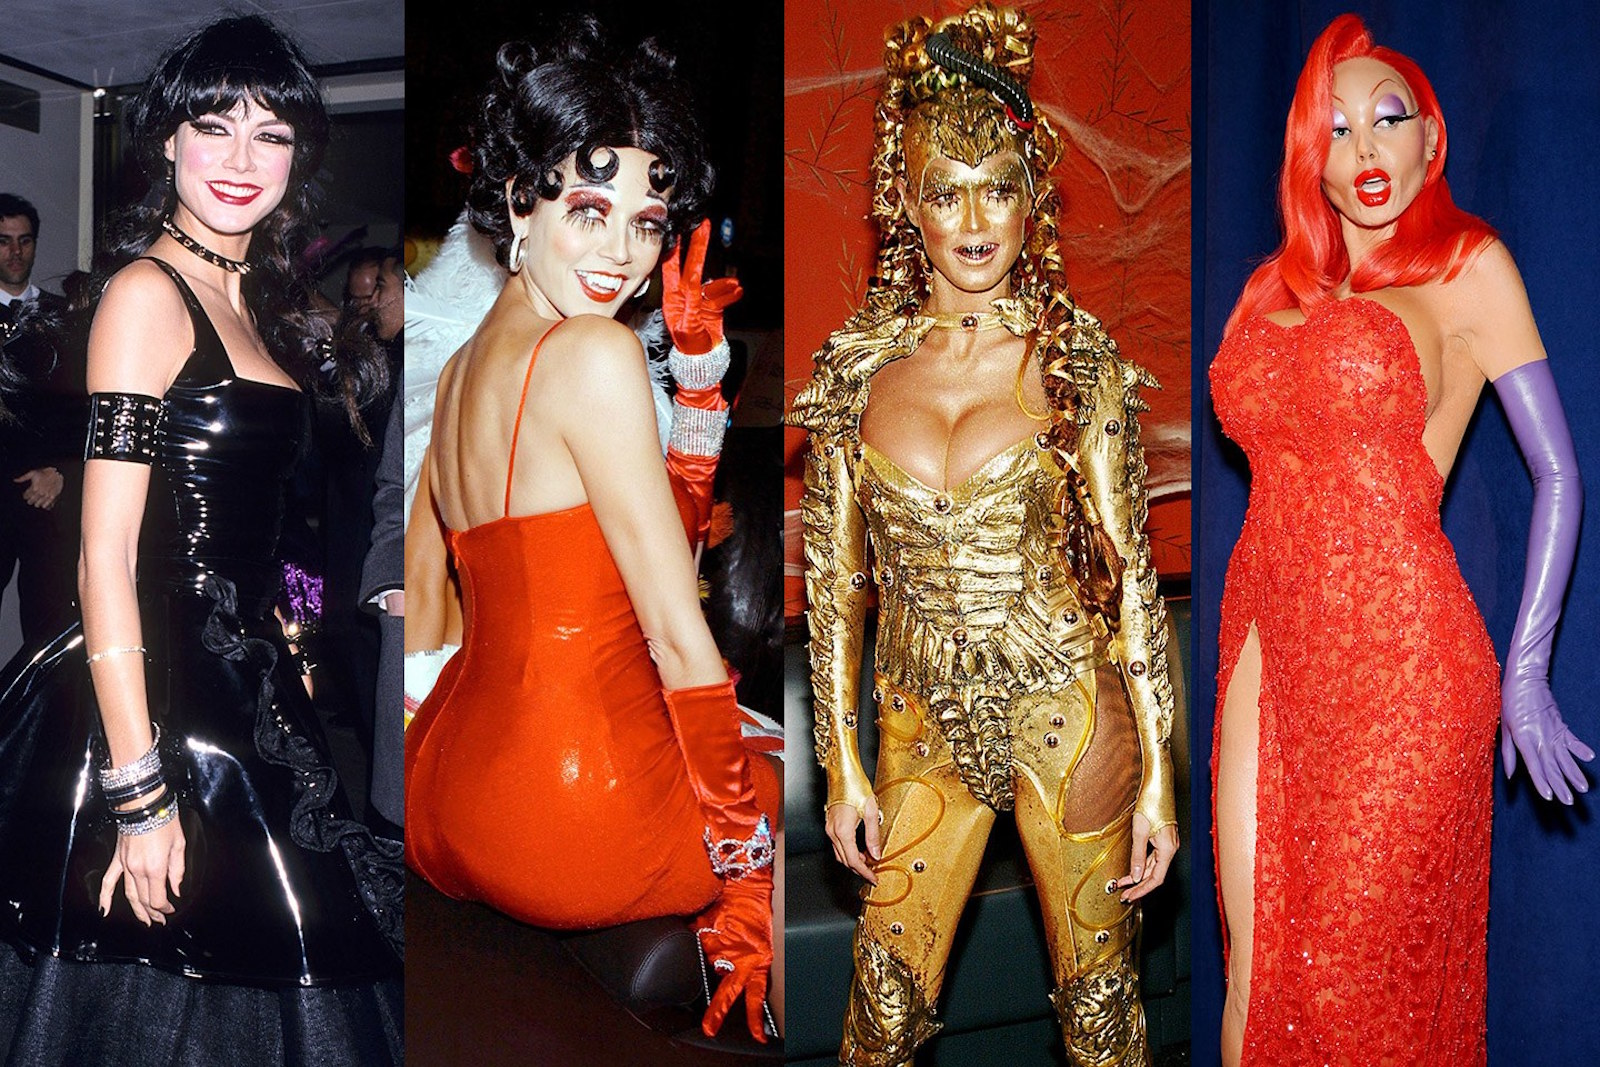 WATCH: Heidi Klum: The Reigning Queen of Halloween - VIVA GLAM ...